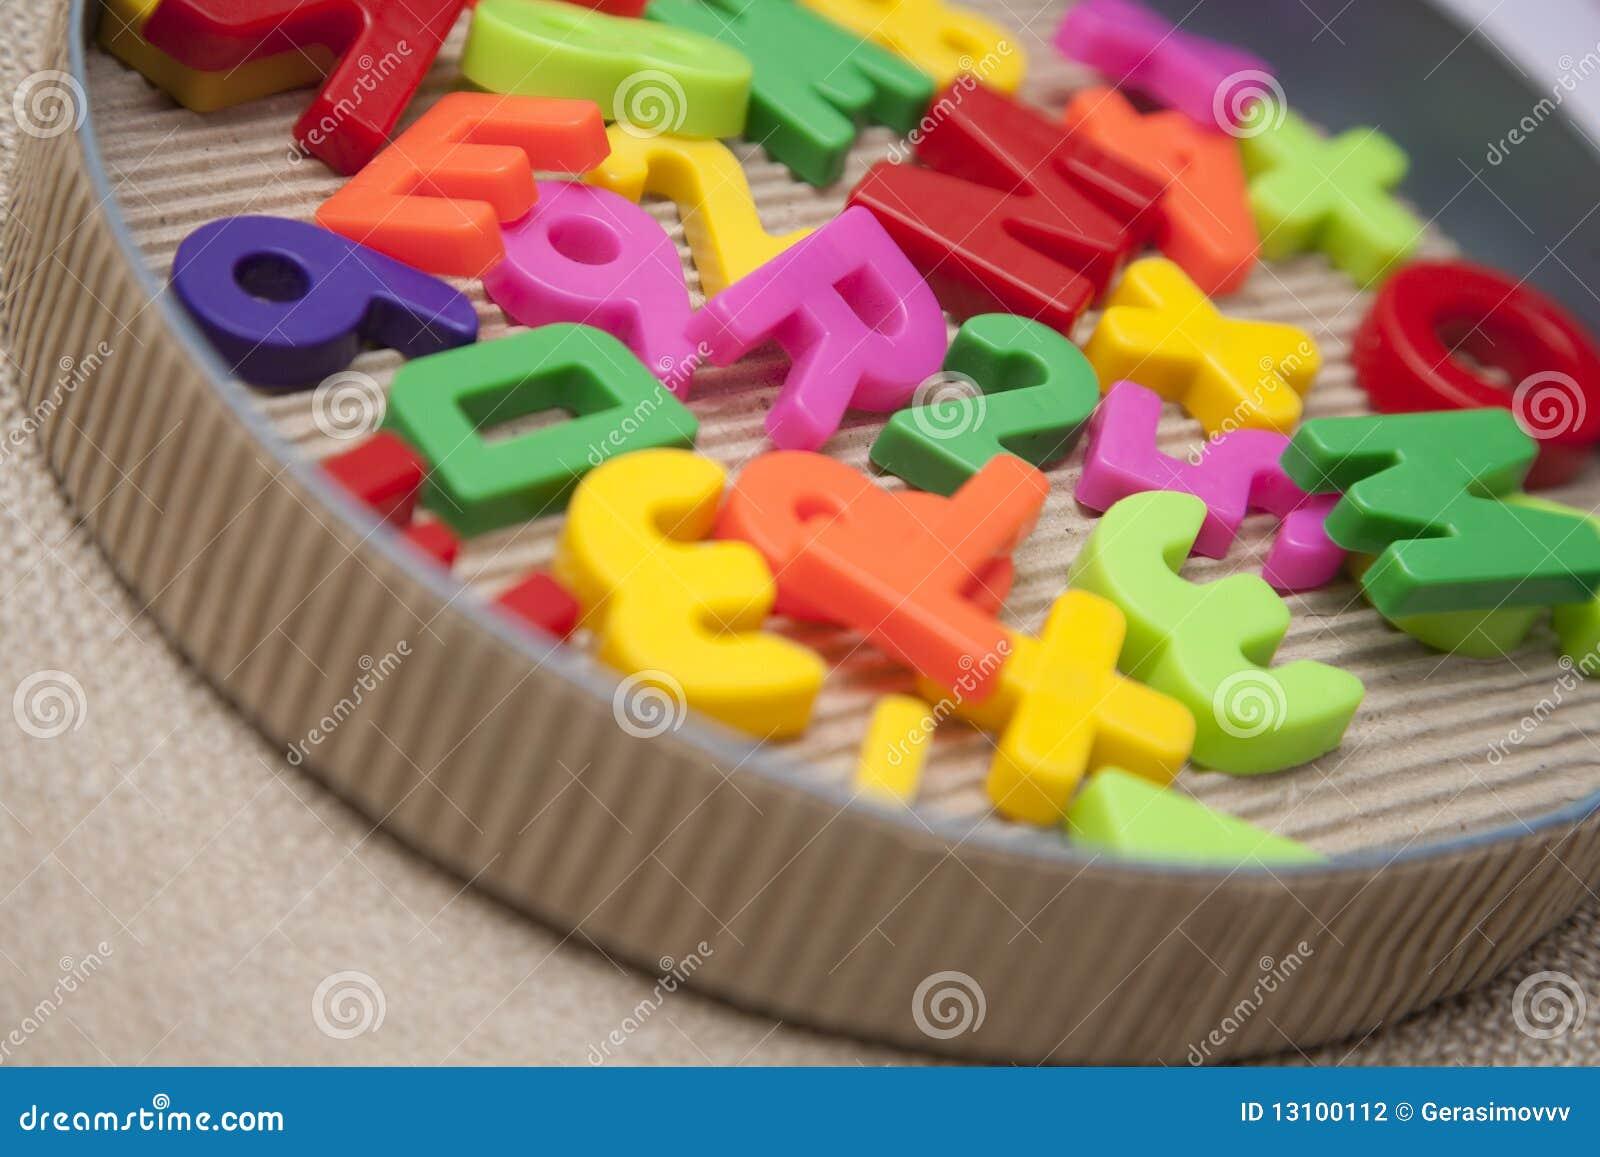 Insieme delle lettere e delle cifre magnetiche